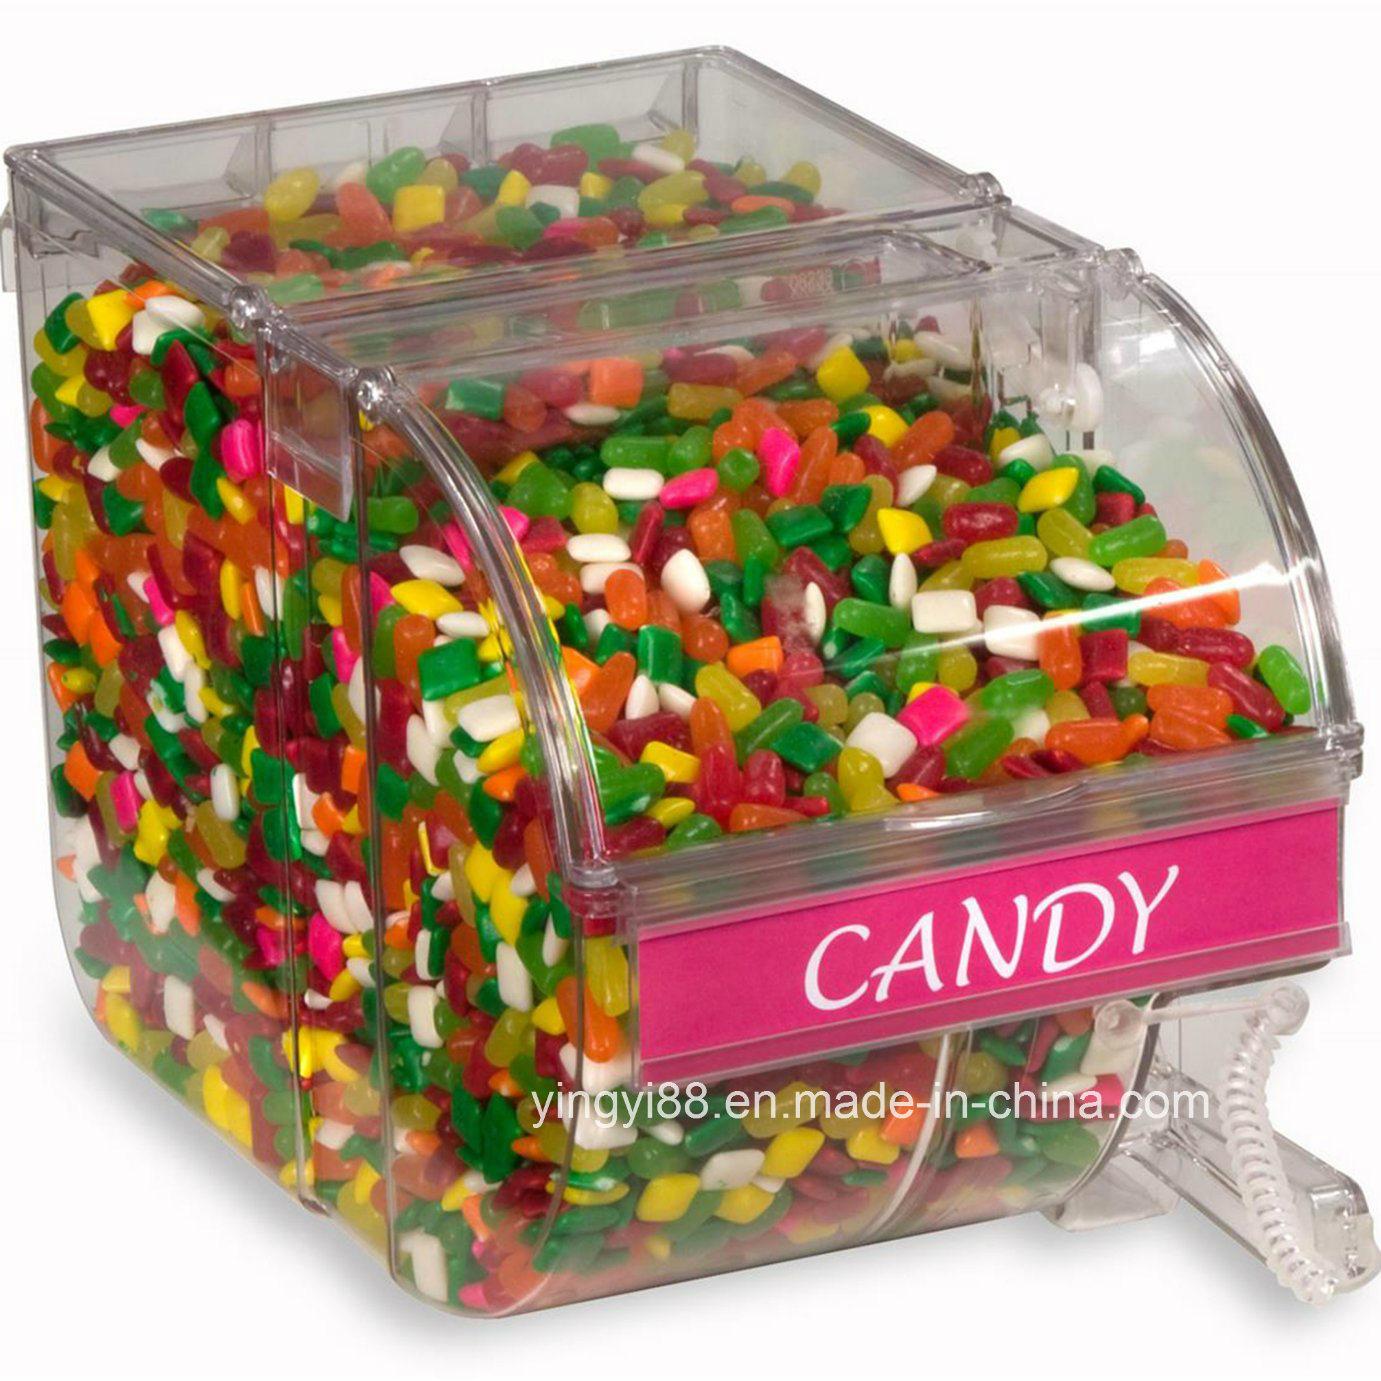 Customized Acrylic Gift Box/Candy Box/ Acrylic Display Box